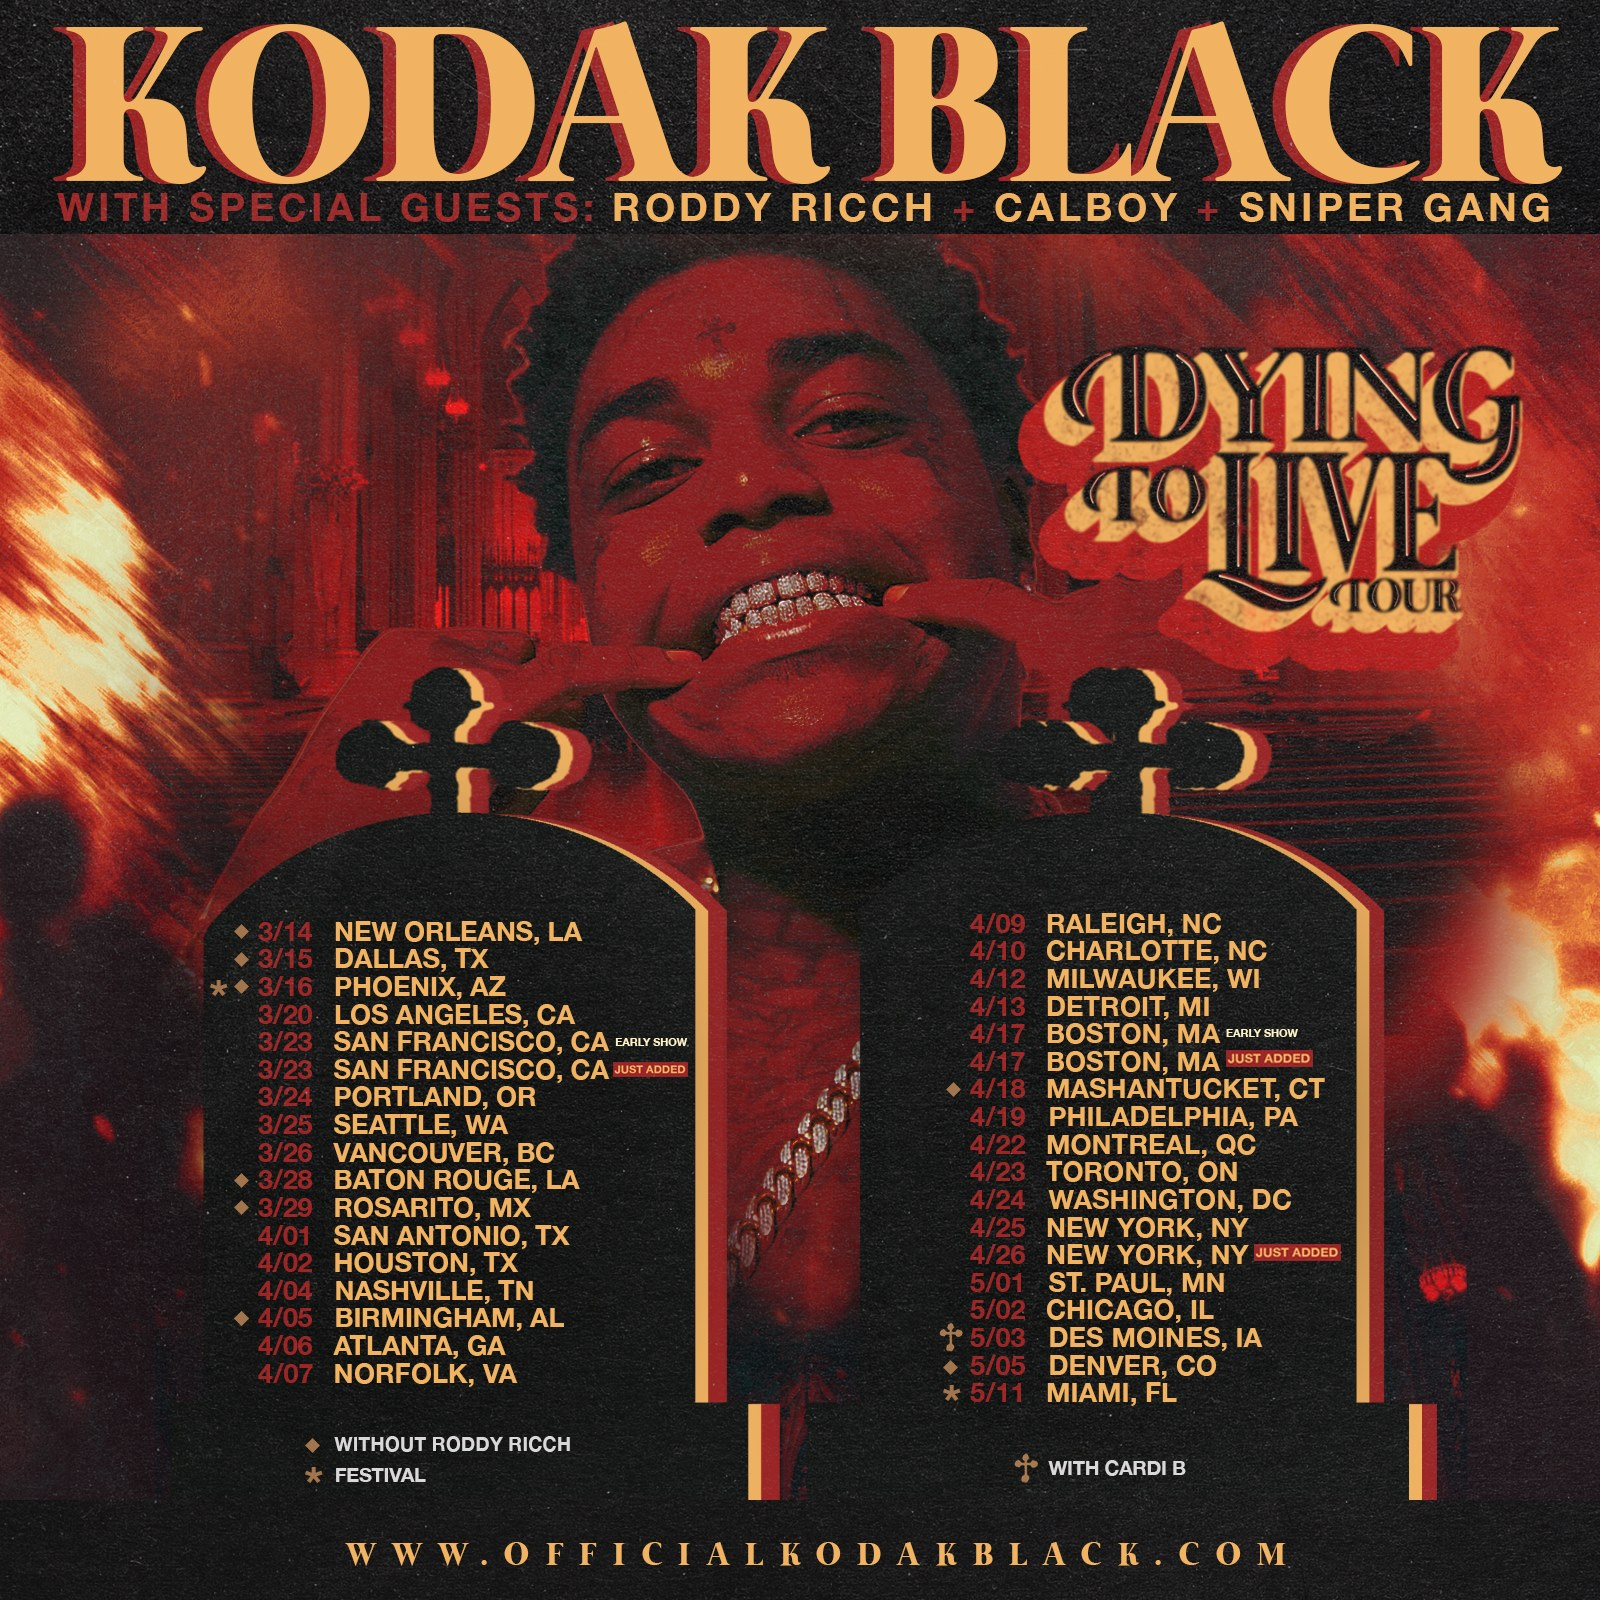 kodak black denver meet and greet